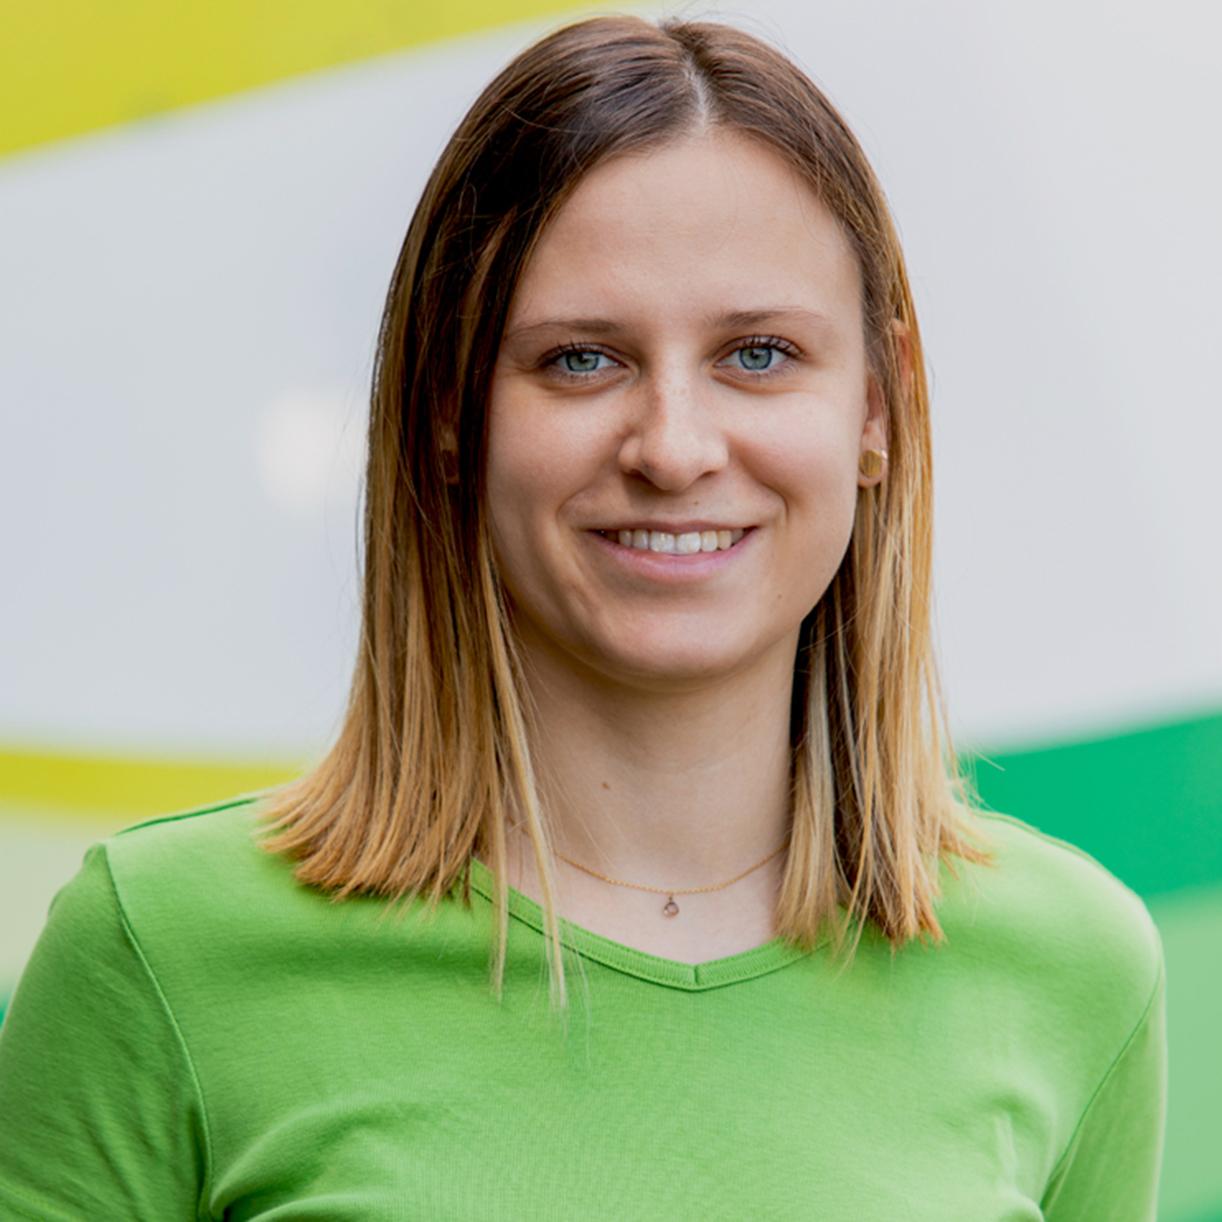 Eva-Maria Freissmuth